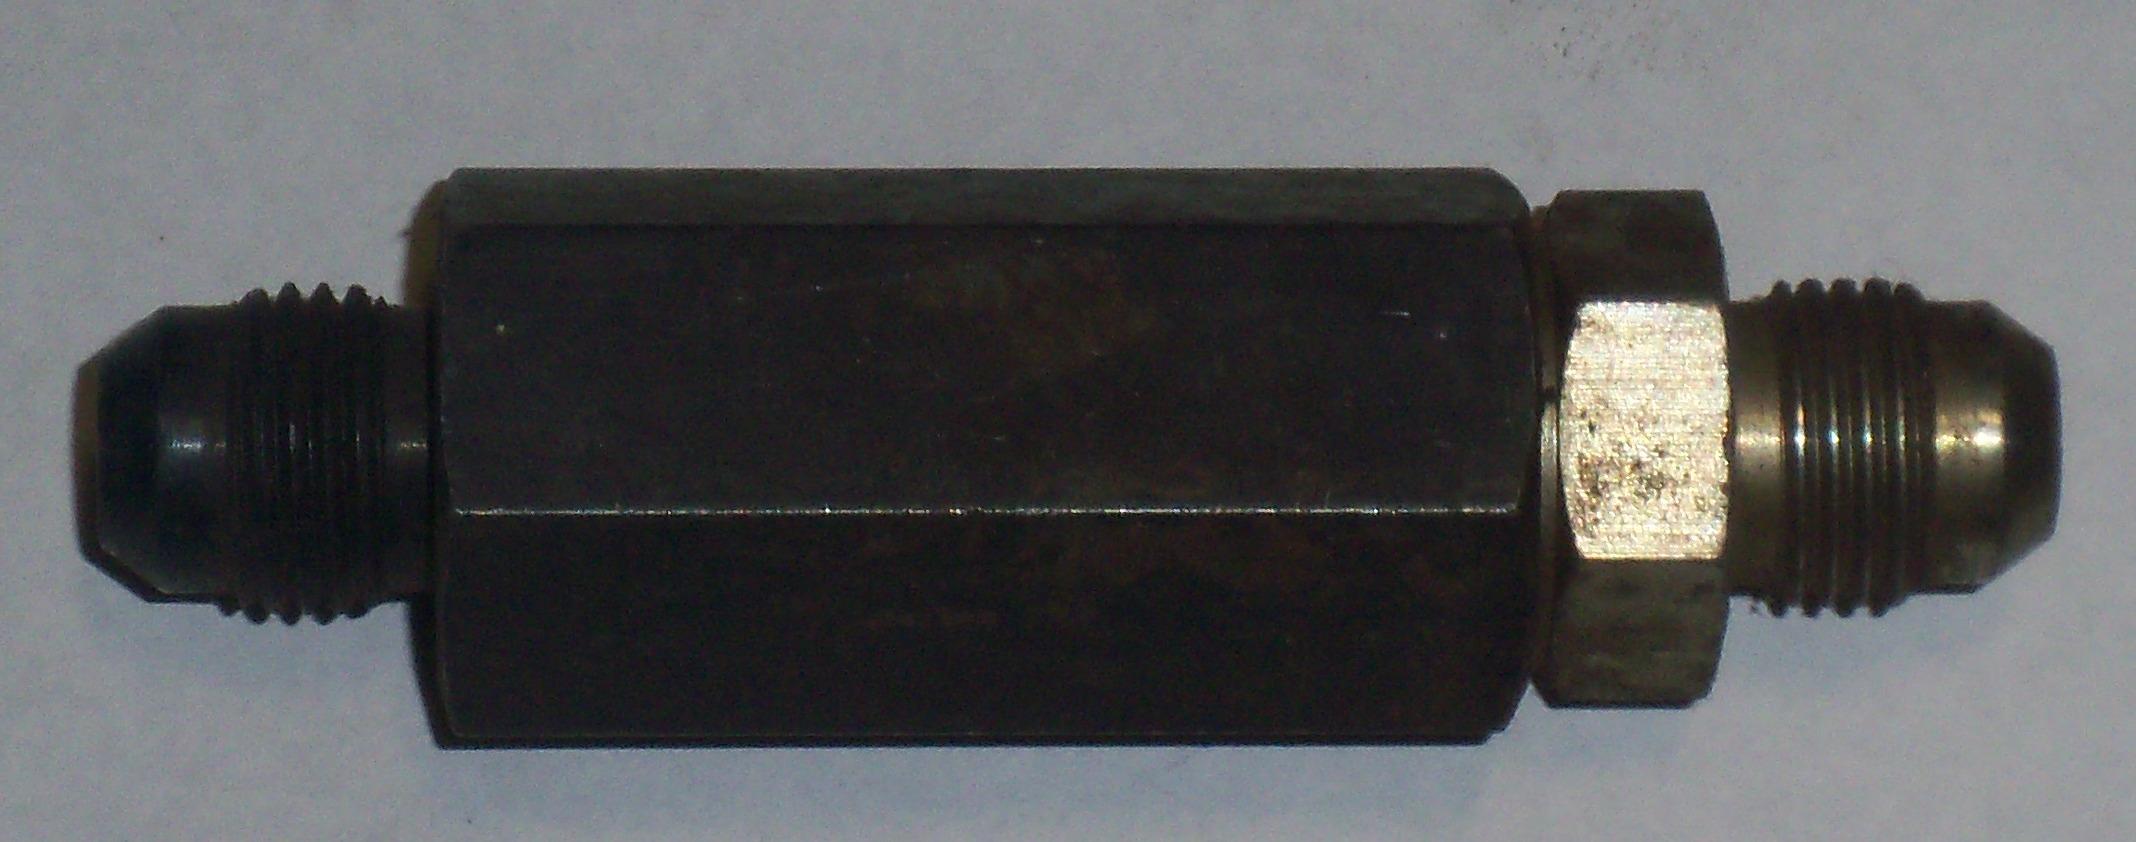 P89155.jpg